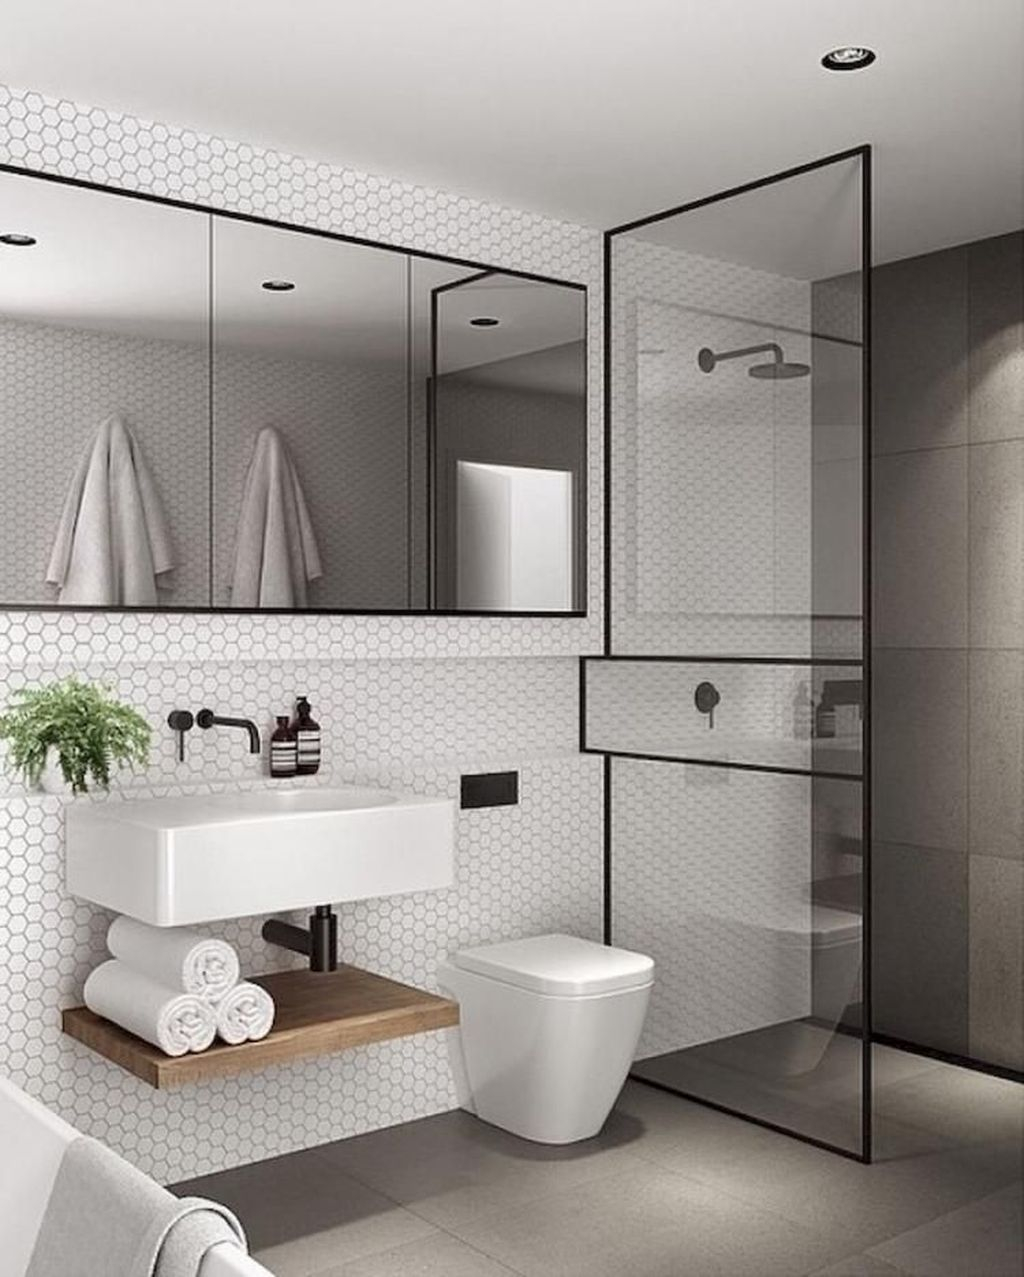 41 Stylish Small Master Bathroom Remodel Design Ideas